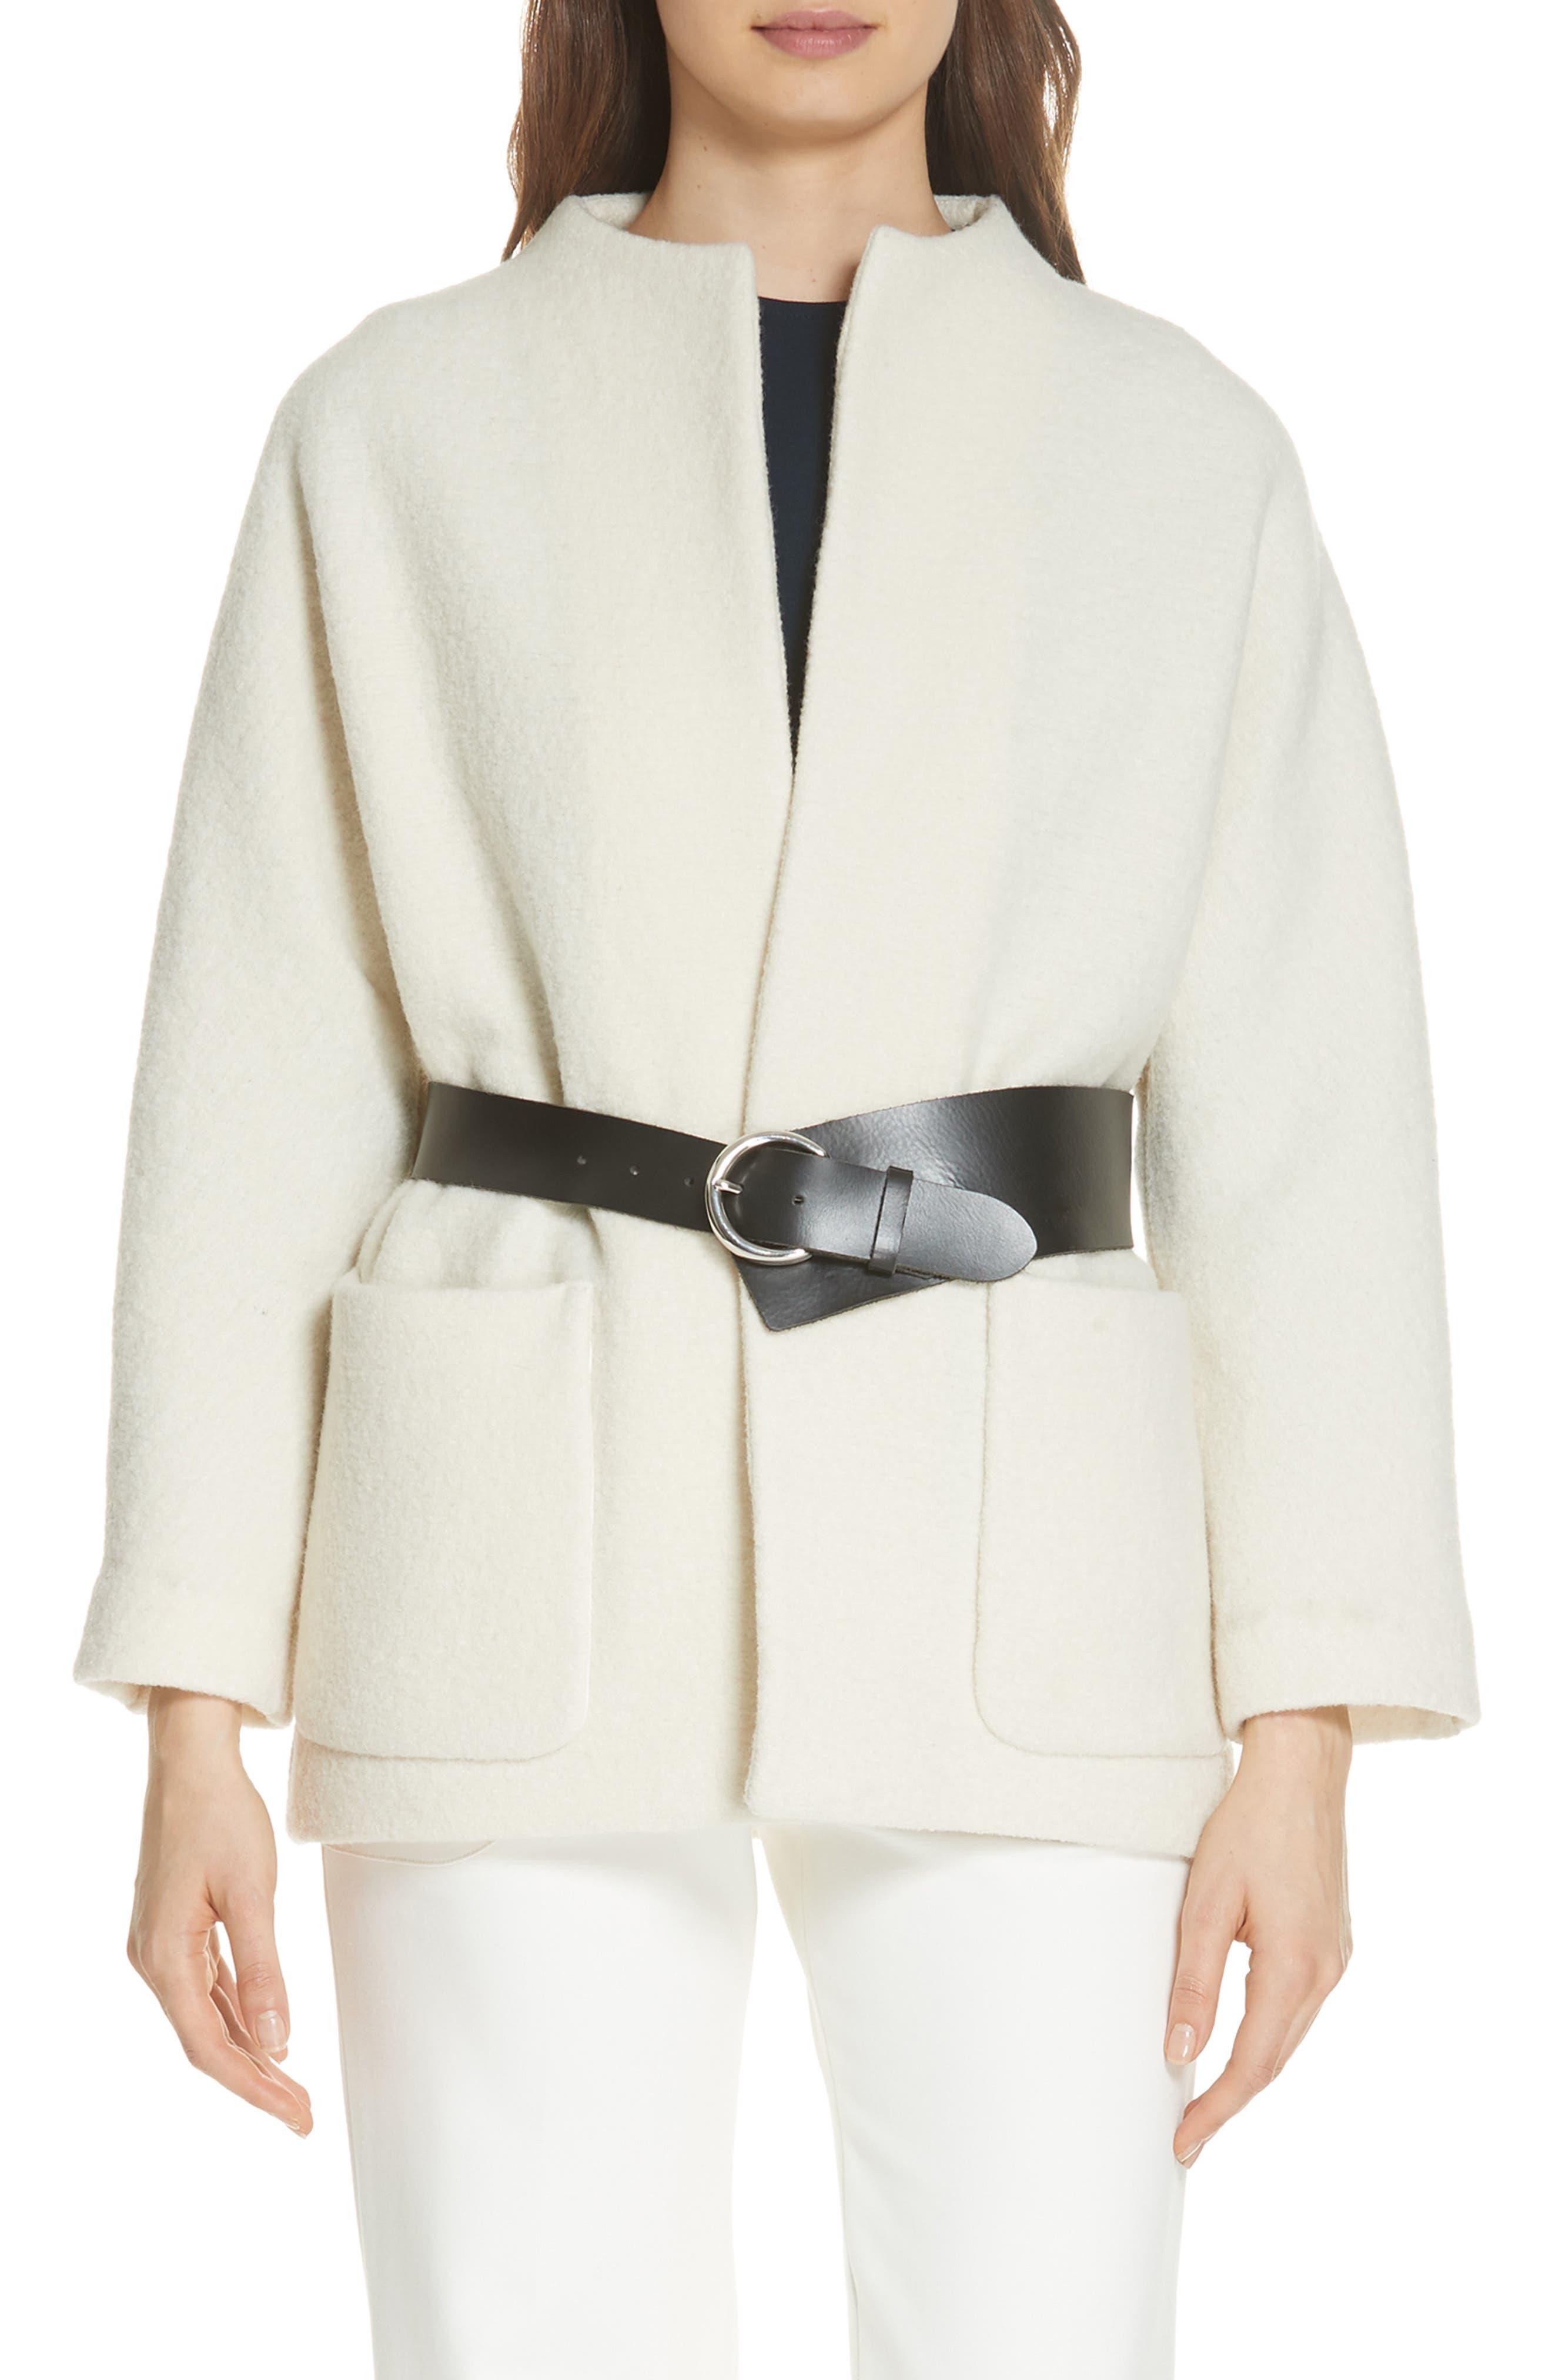 Clif Belted Wool Coat,                             Main thumbnail 1, color,                             ECRU